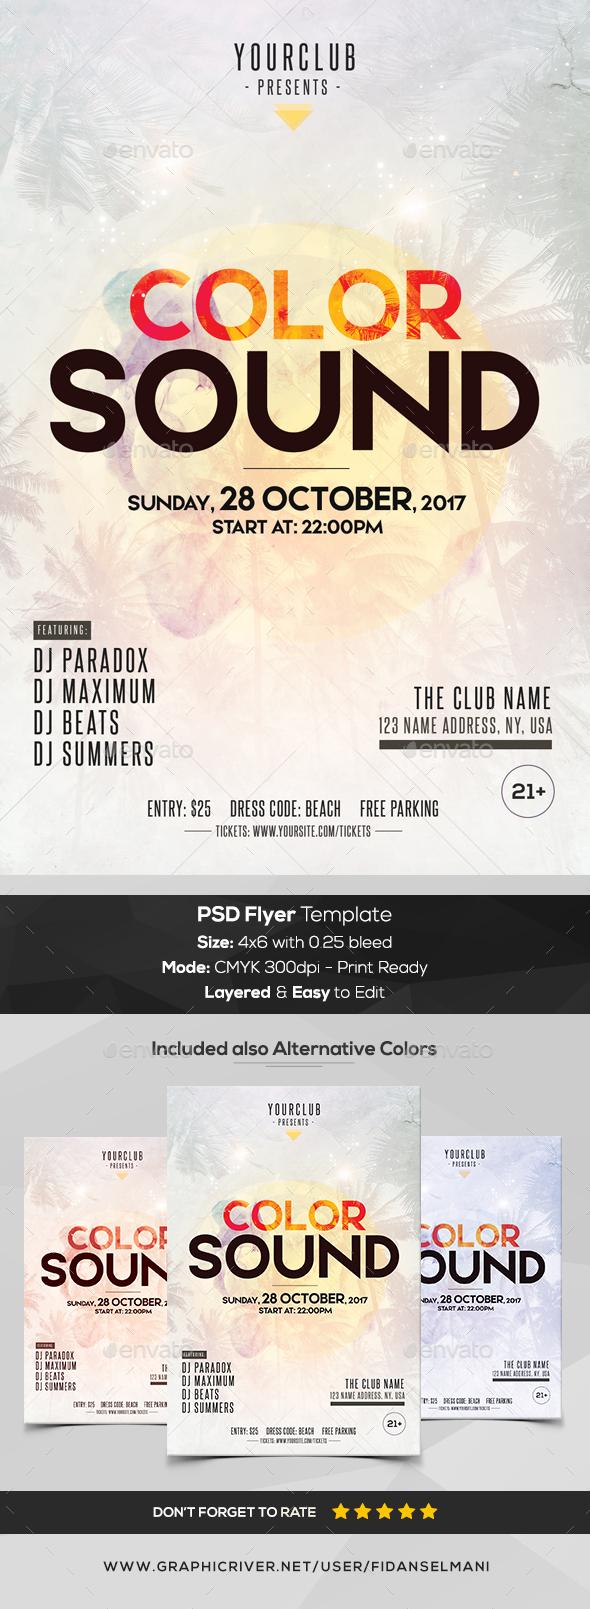 Color Sound - PSD Flyer Template - Flyers Print Templates